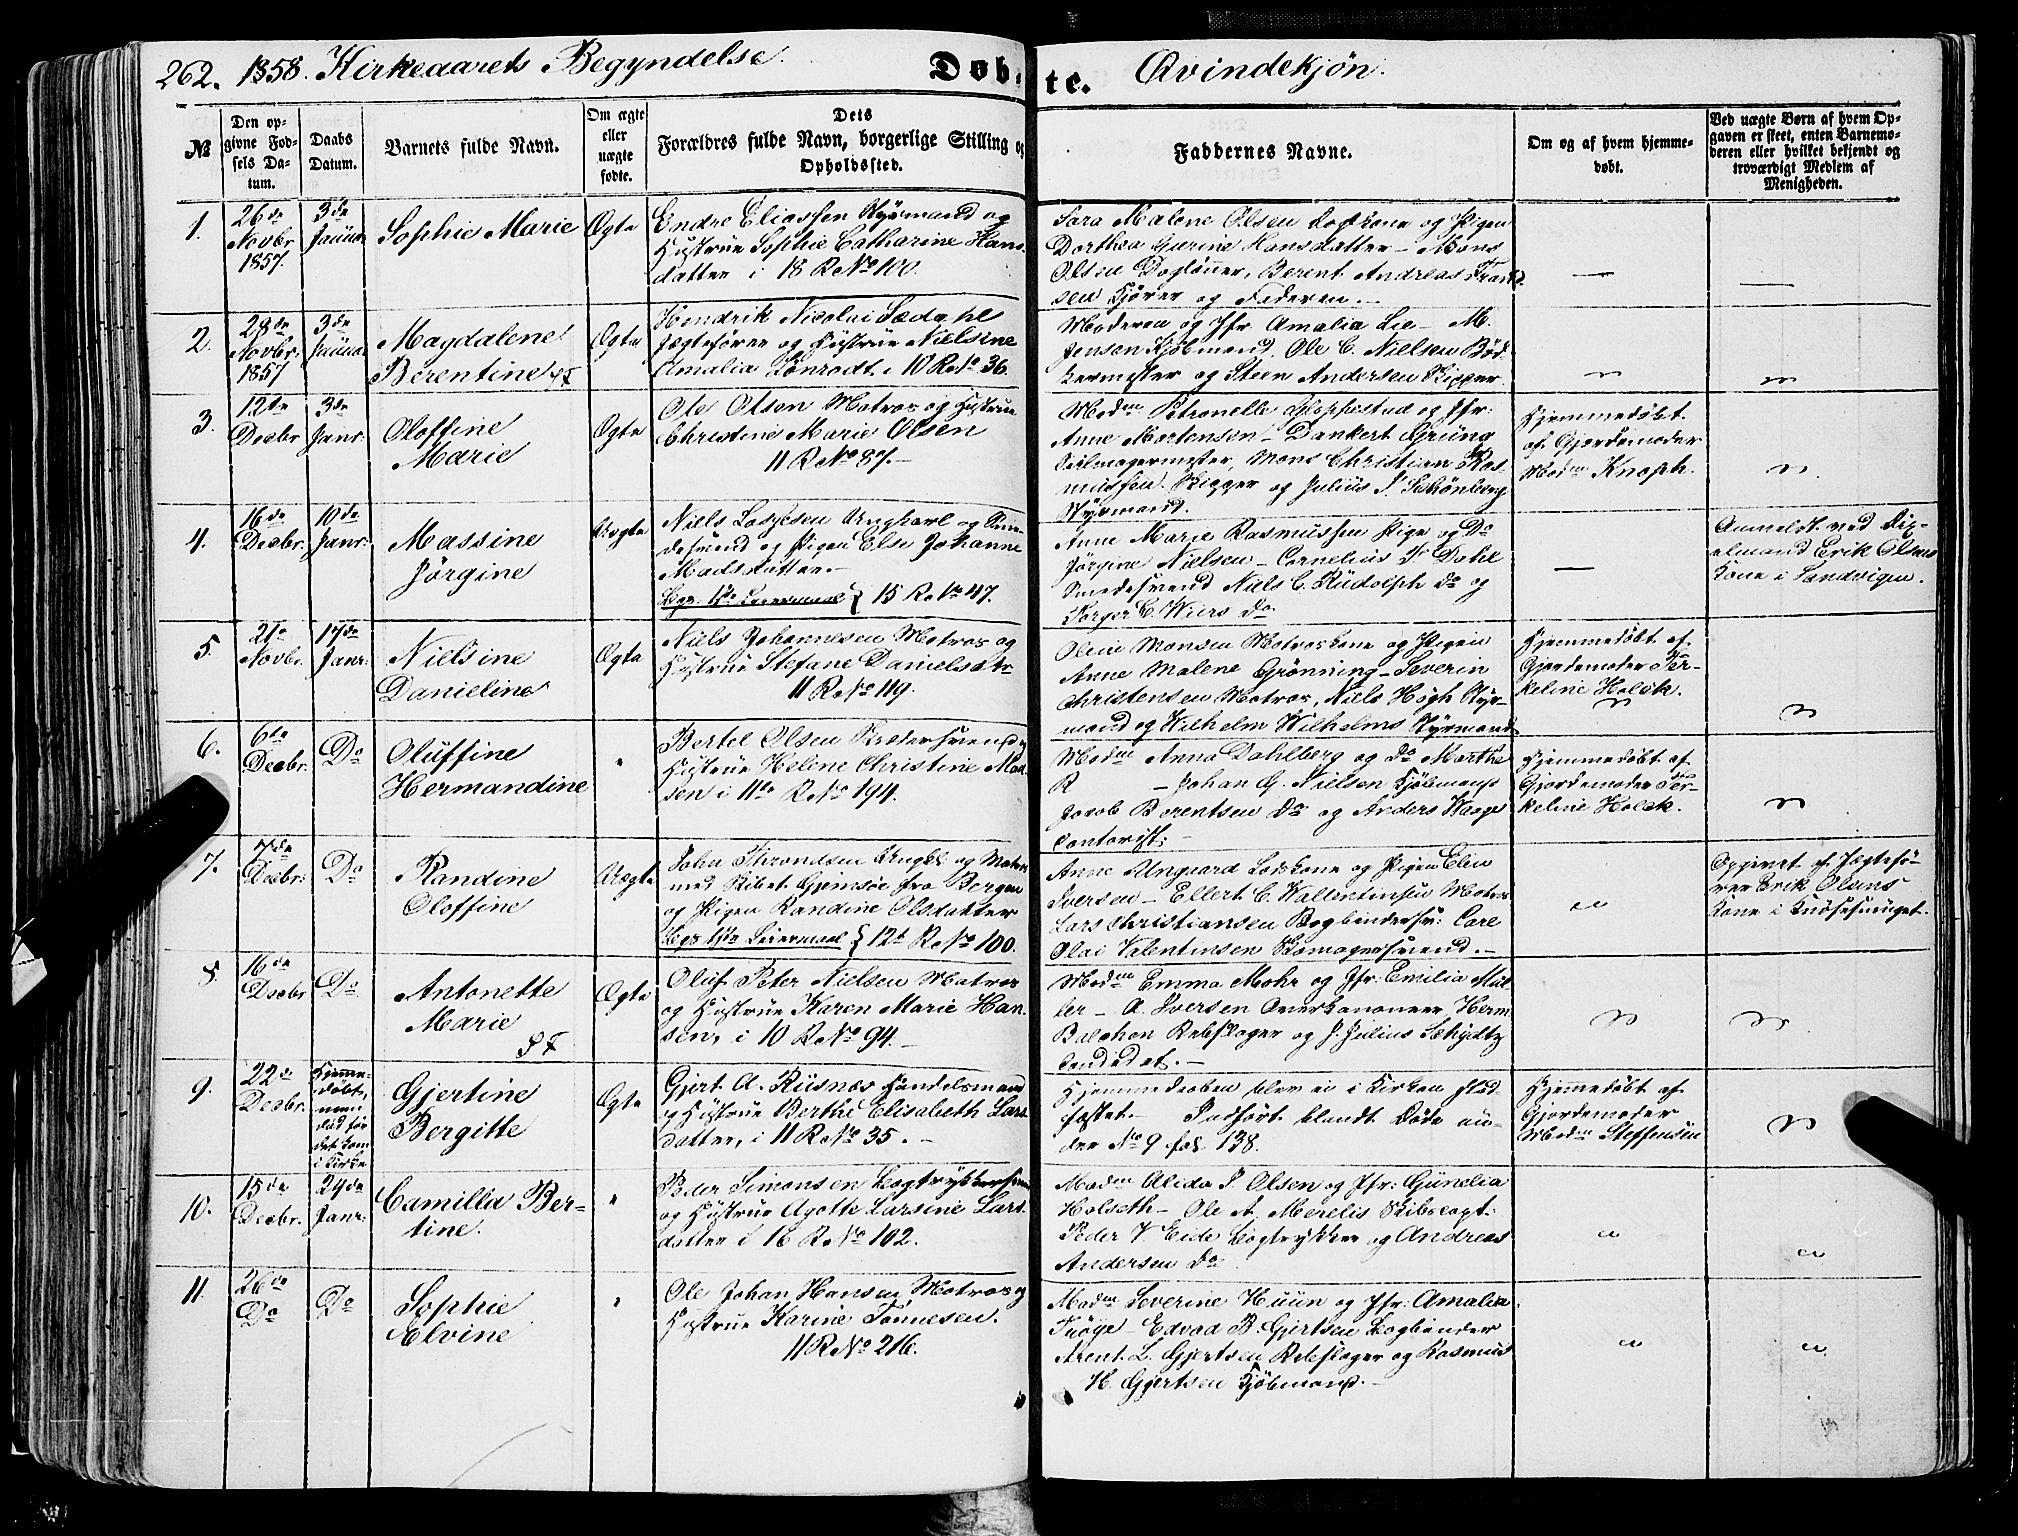 SAB, Domkirken Sokneprestembete, H/Haa/L0020: Ministerialbok nr. B 3, 1851-1859, s. 262